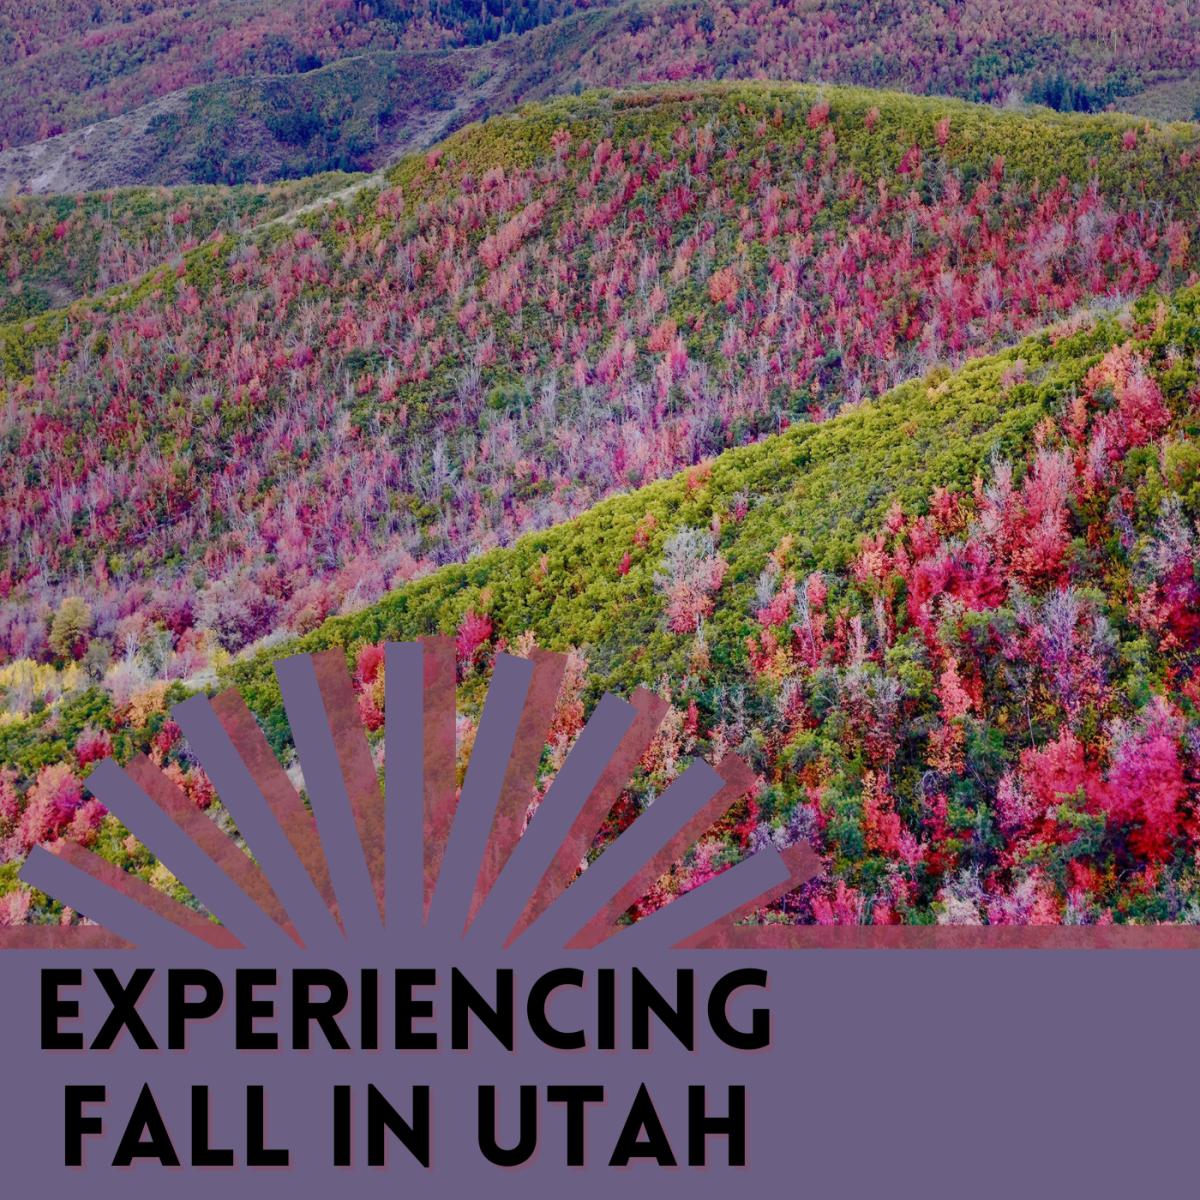 Best spots in Utah for fall foliage